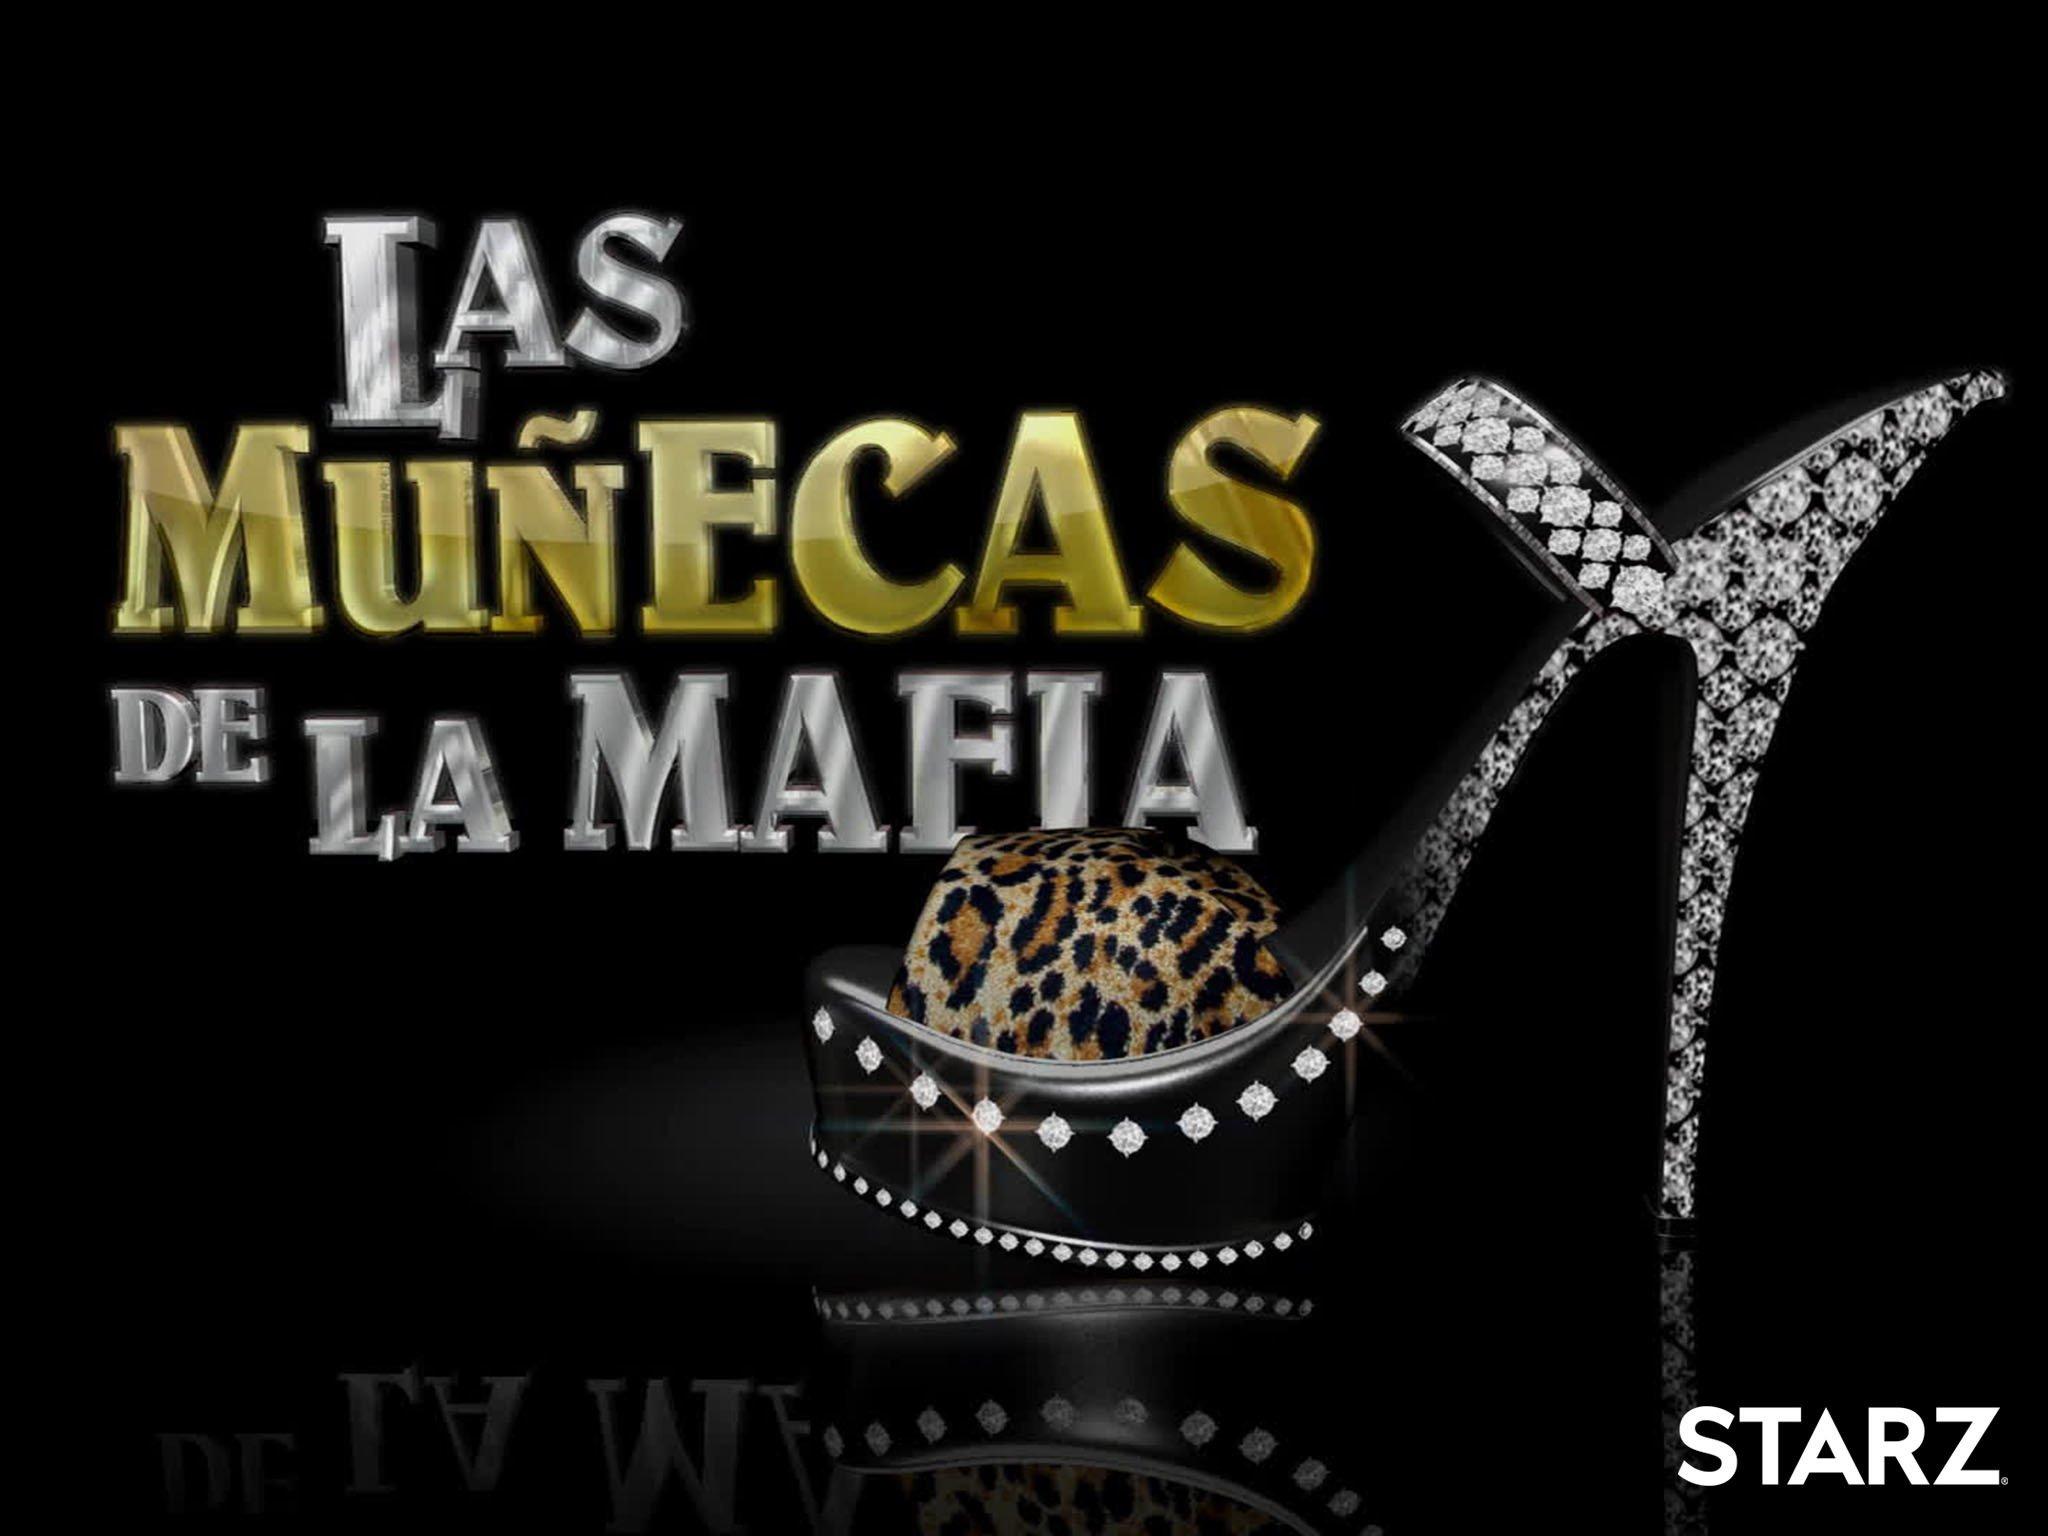 Amazon.com: Las Muñecas De La Mafia: Amparo Grisales, Fernando Solorzano, Angelica Blandon, Andrea Gomez, Luis Alberto Restrepo